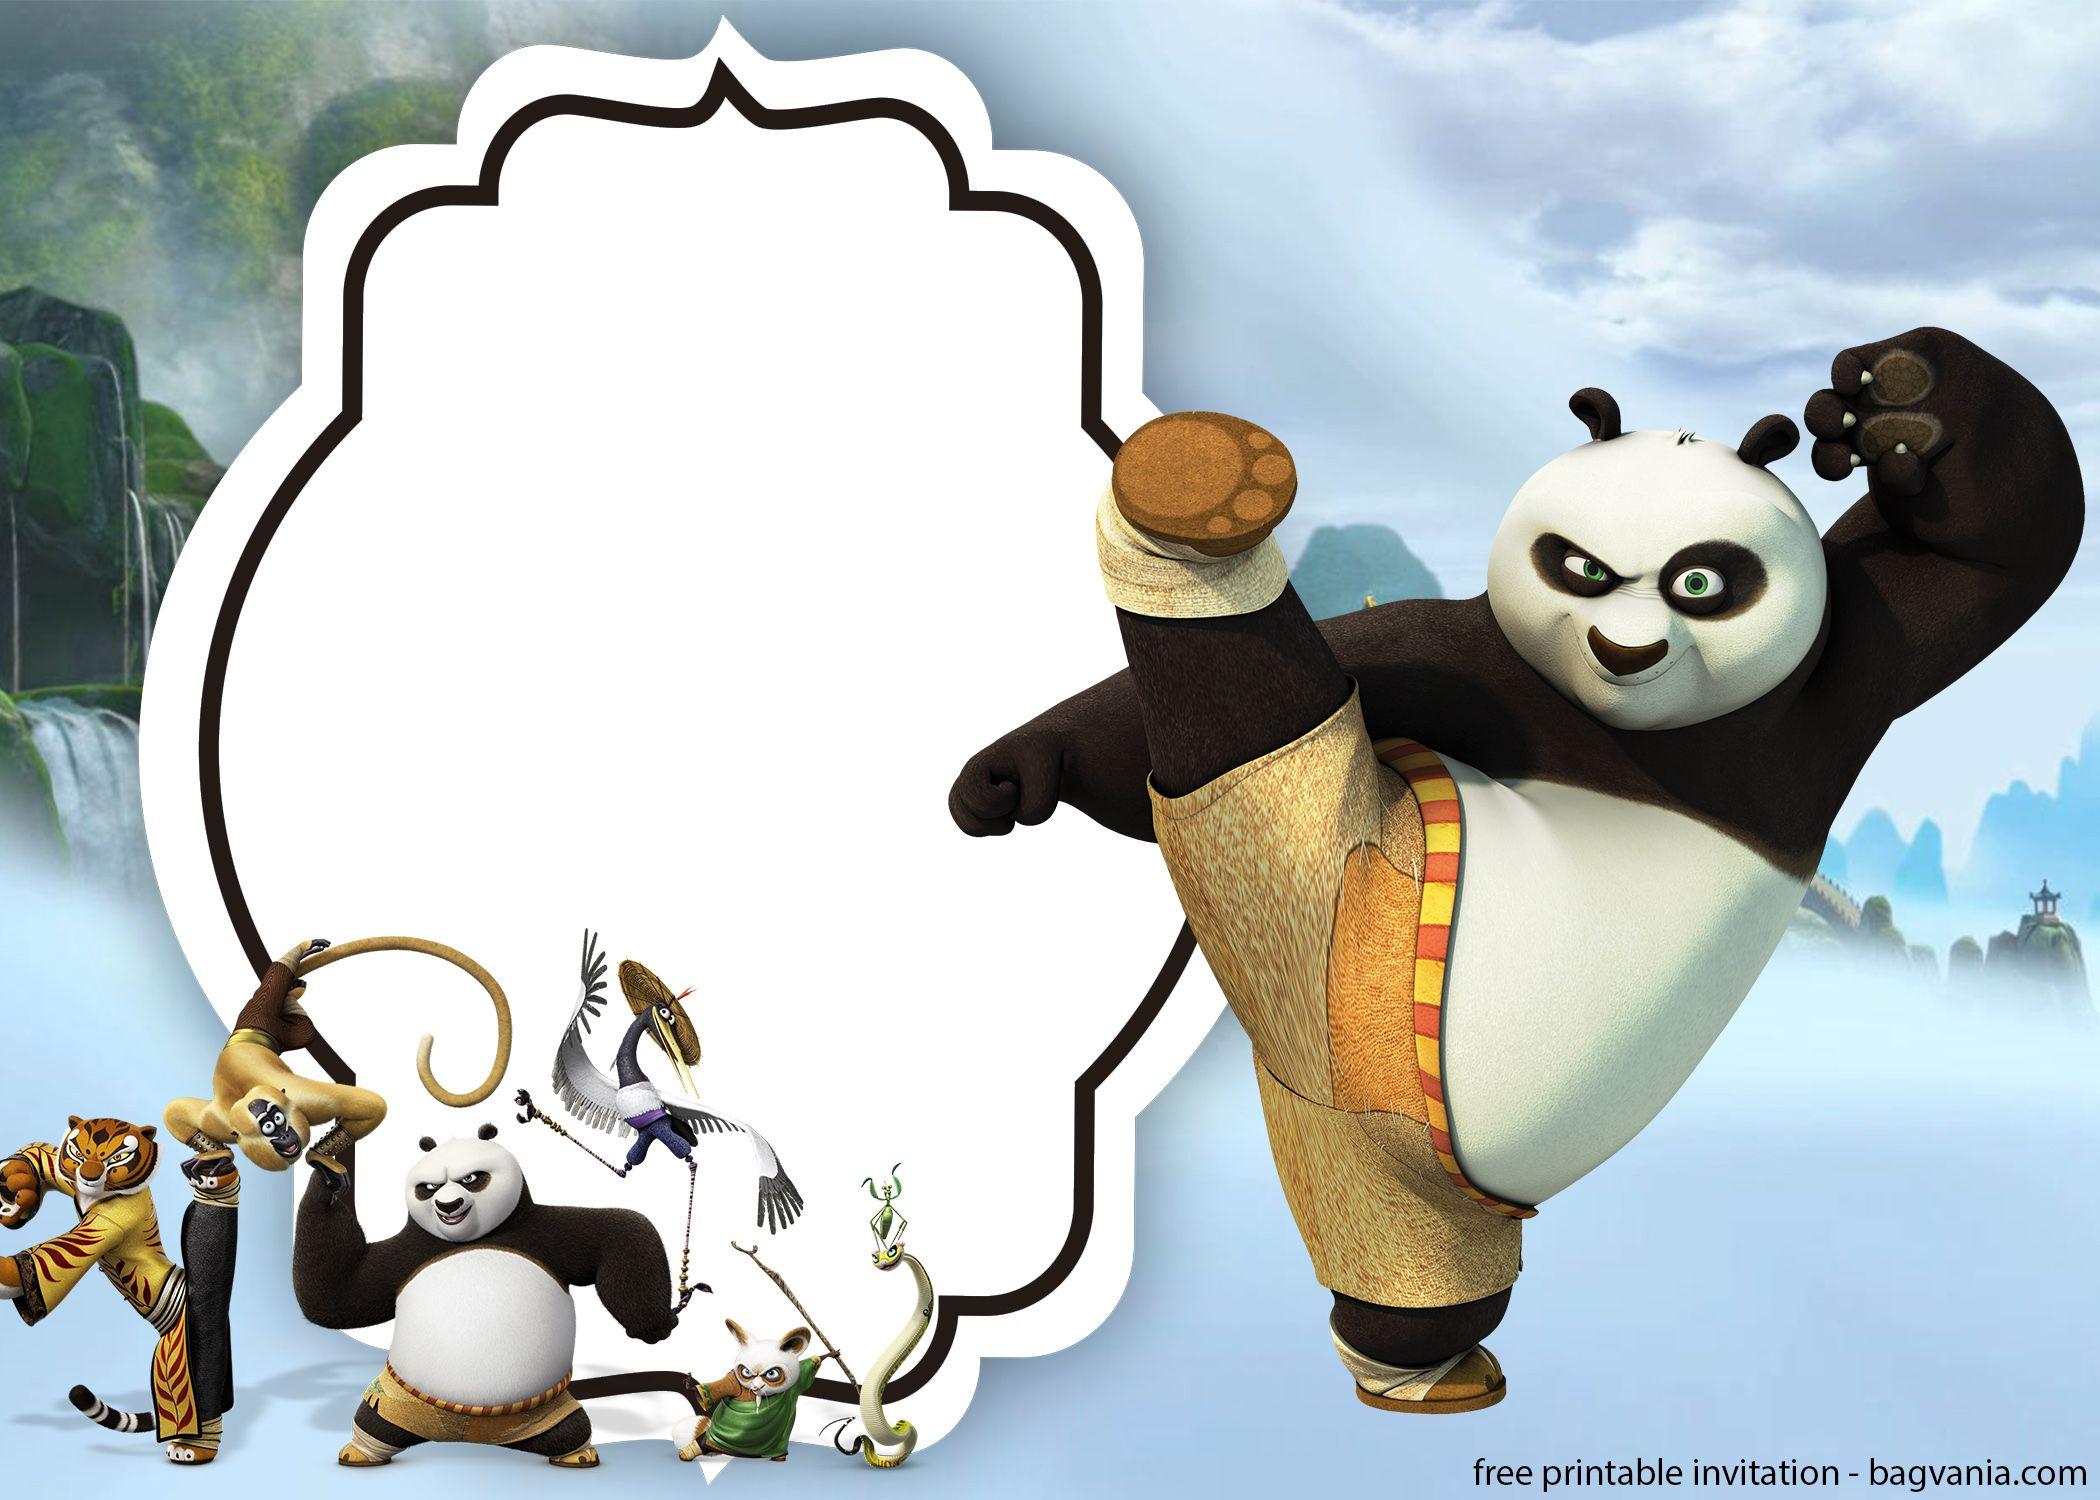 Free Kungfu Panda Invitations Templates   Bagvania Invitation   Free - Panda Bear Invitations Free Printable